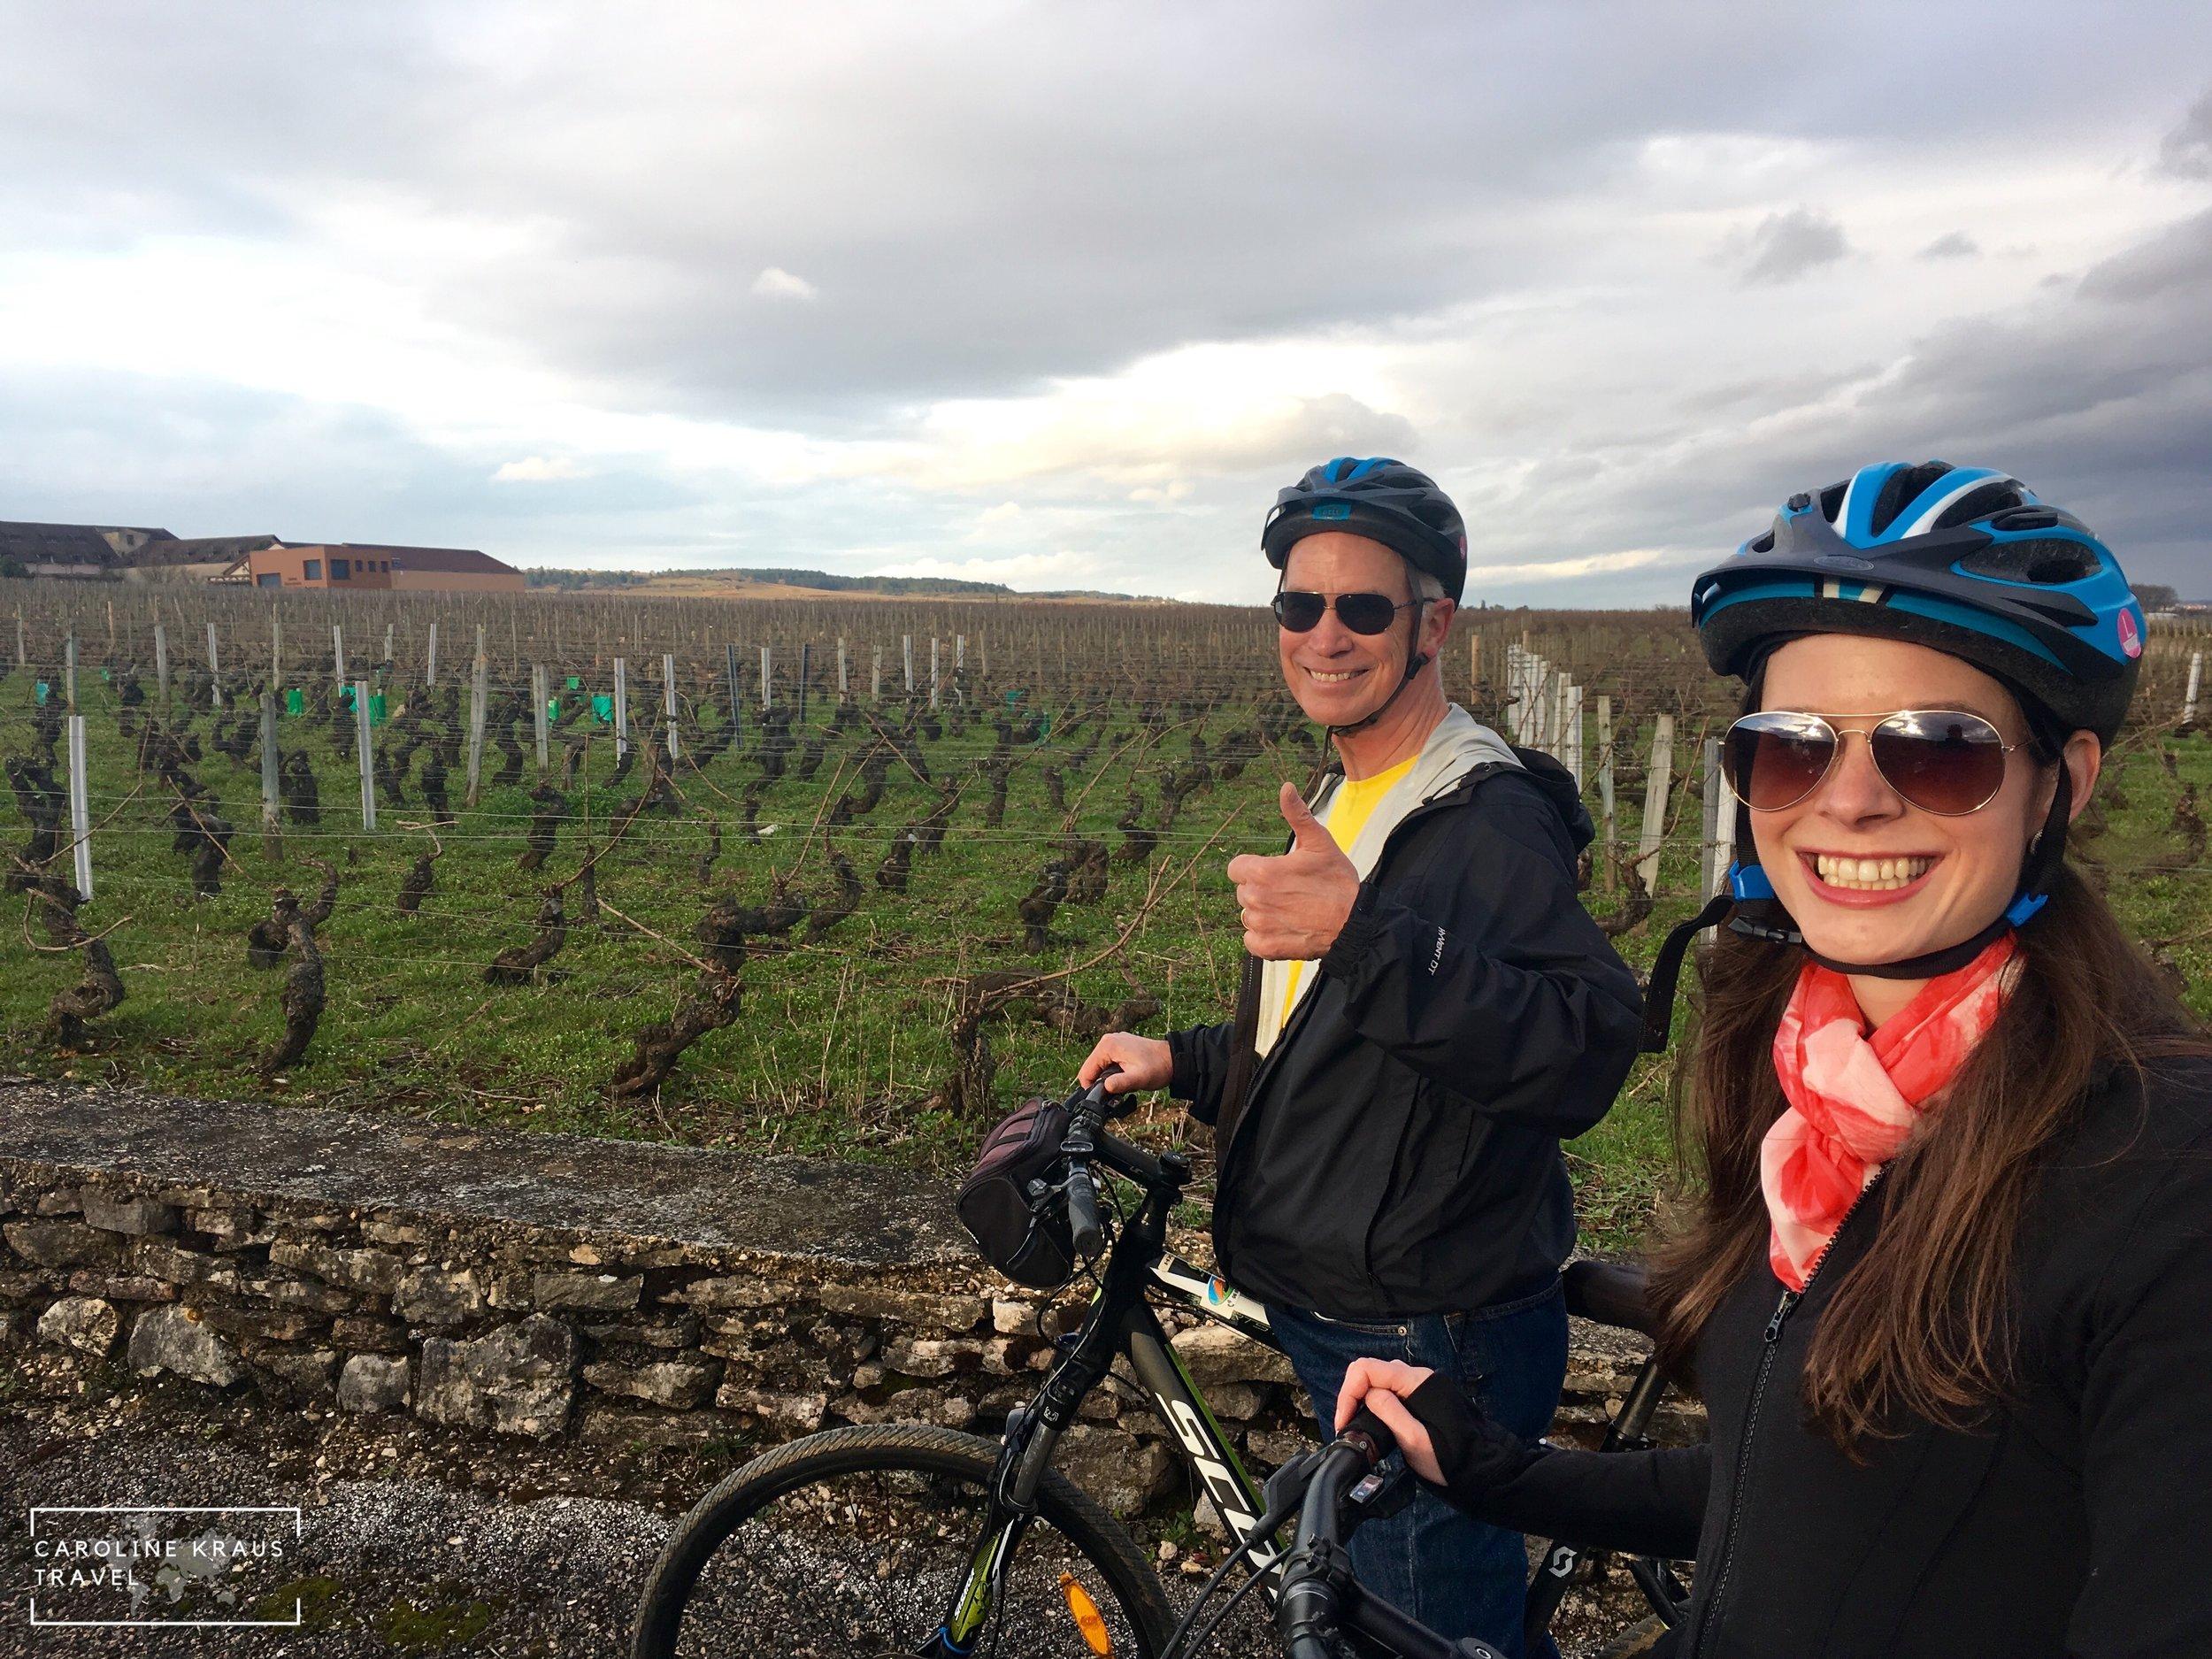 Biking through the vineyads